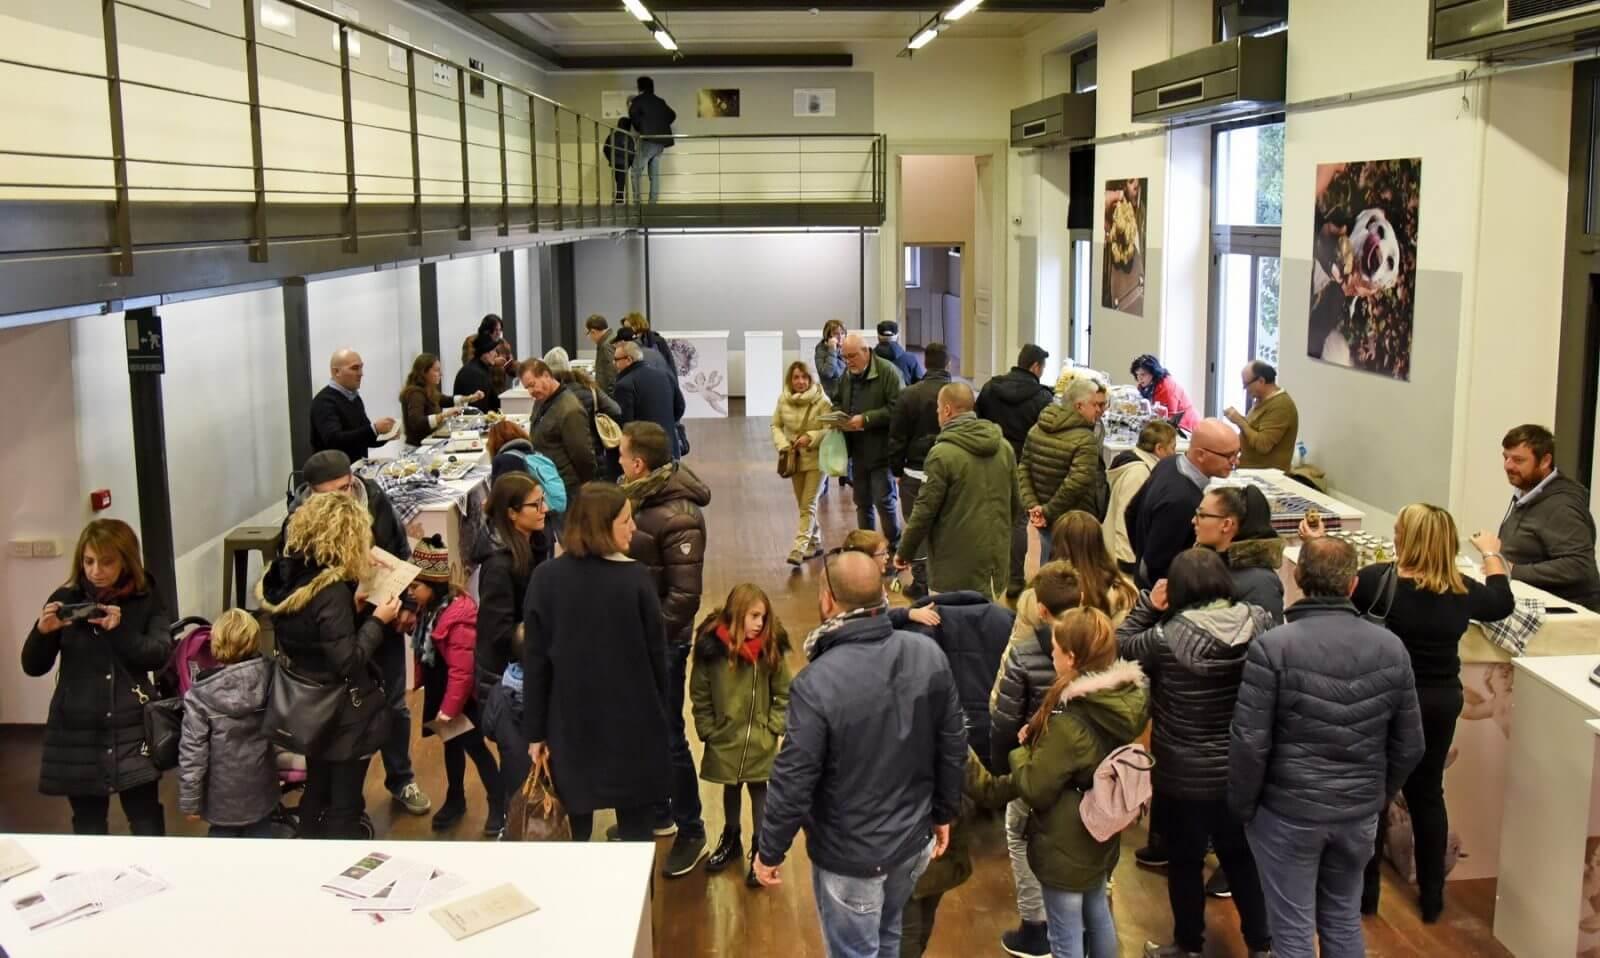 Asti truffle fair 2019